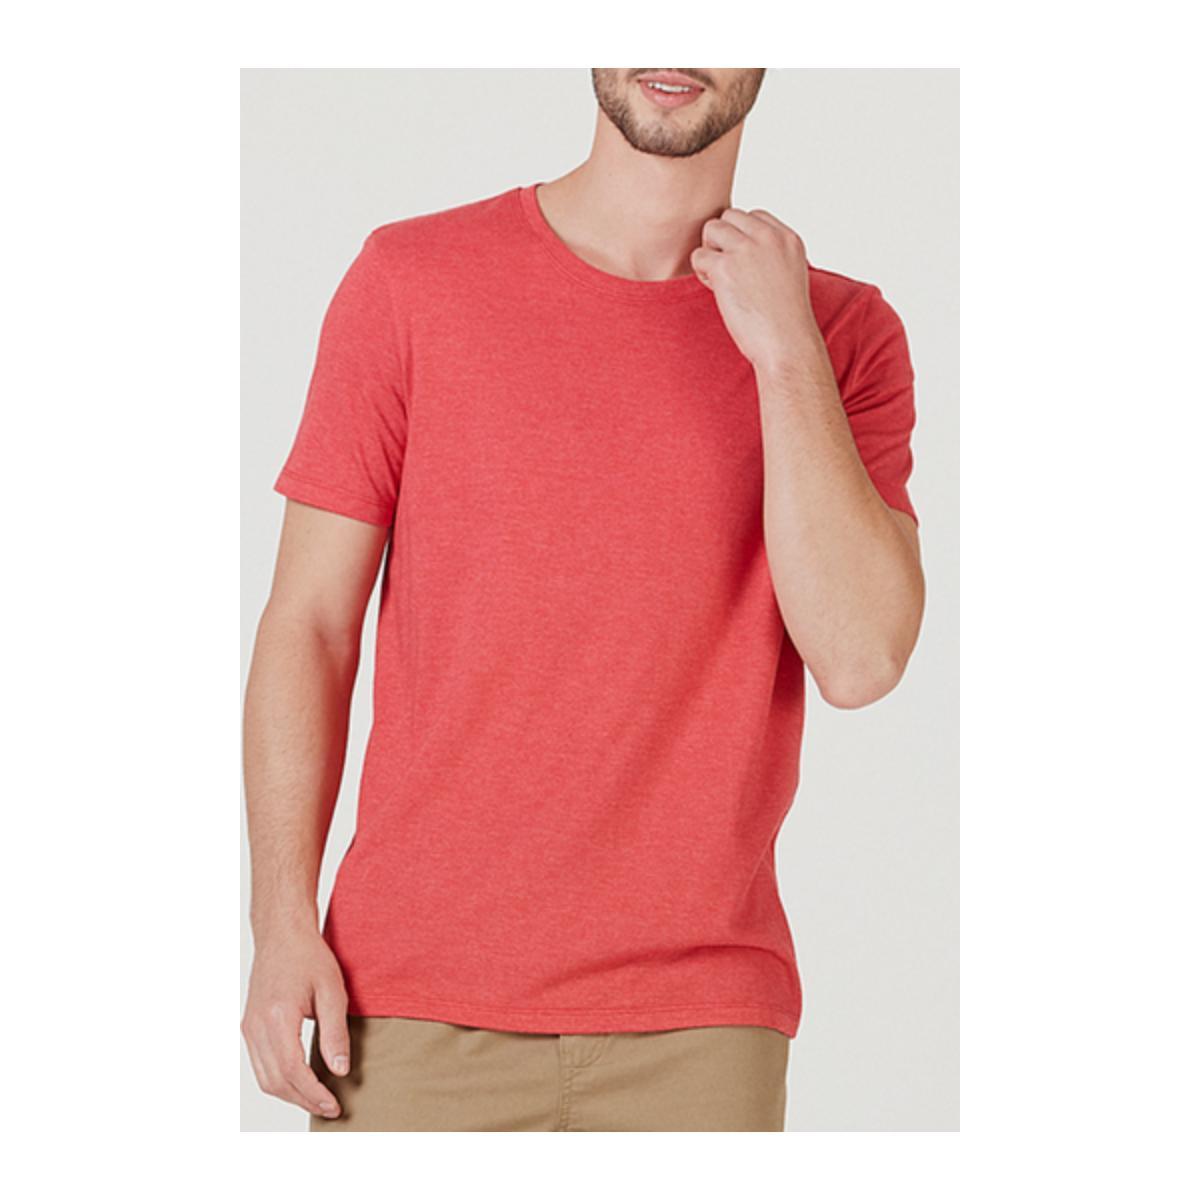 Camiseta Masculina Hering 0201 2ben Vermelho